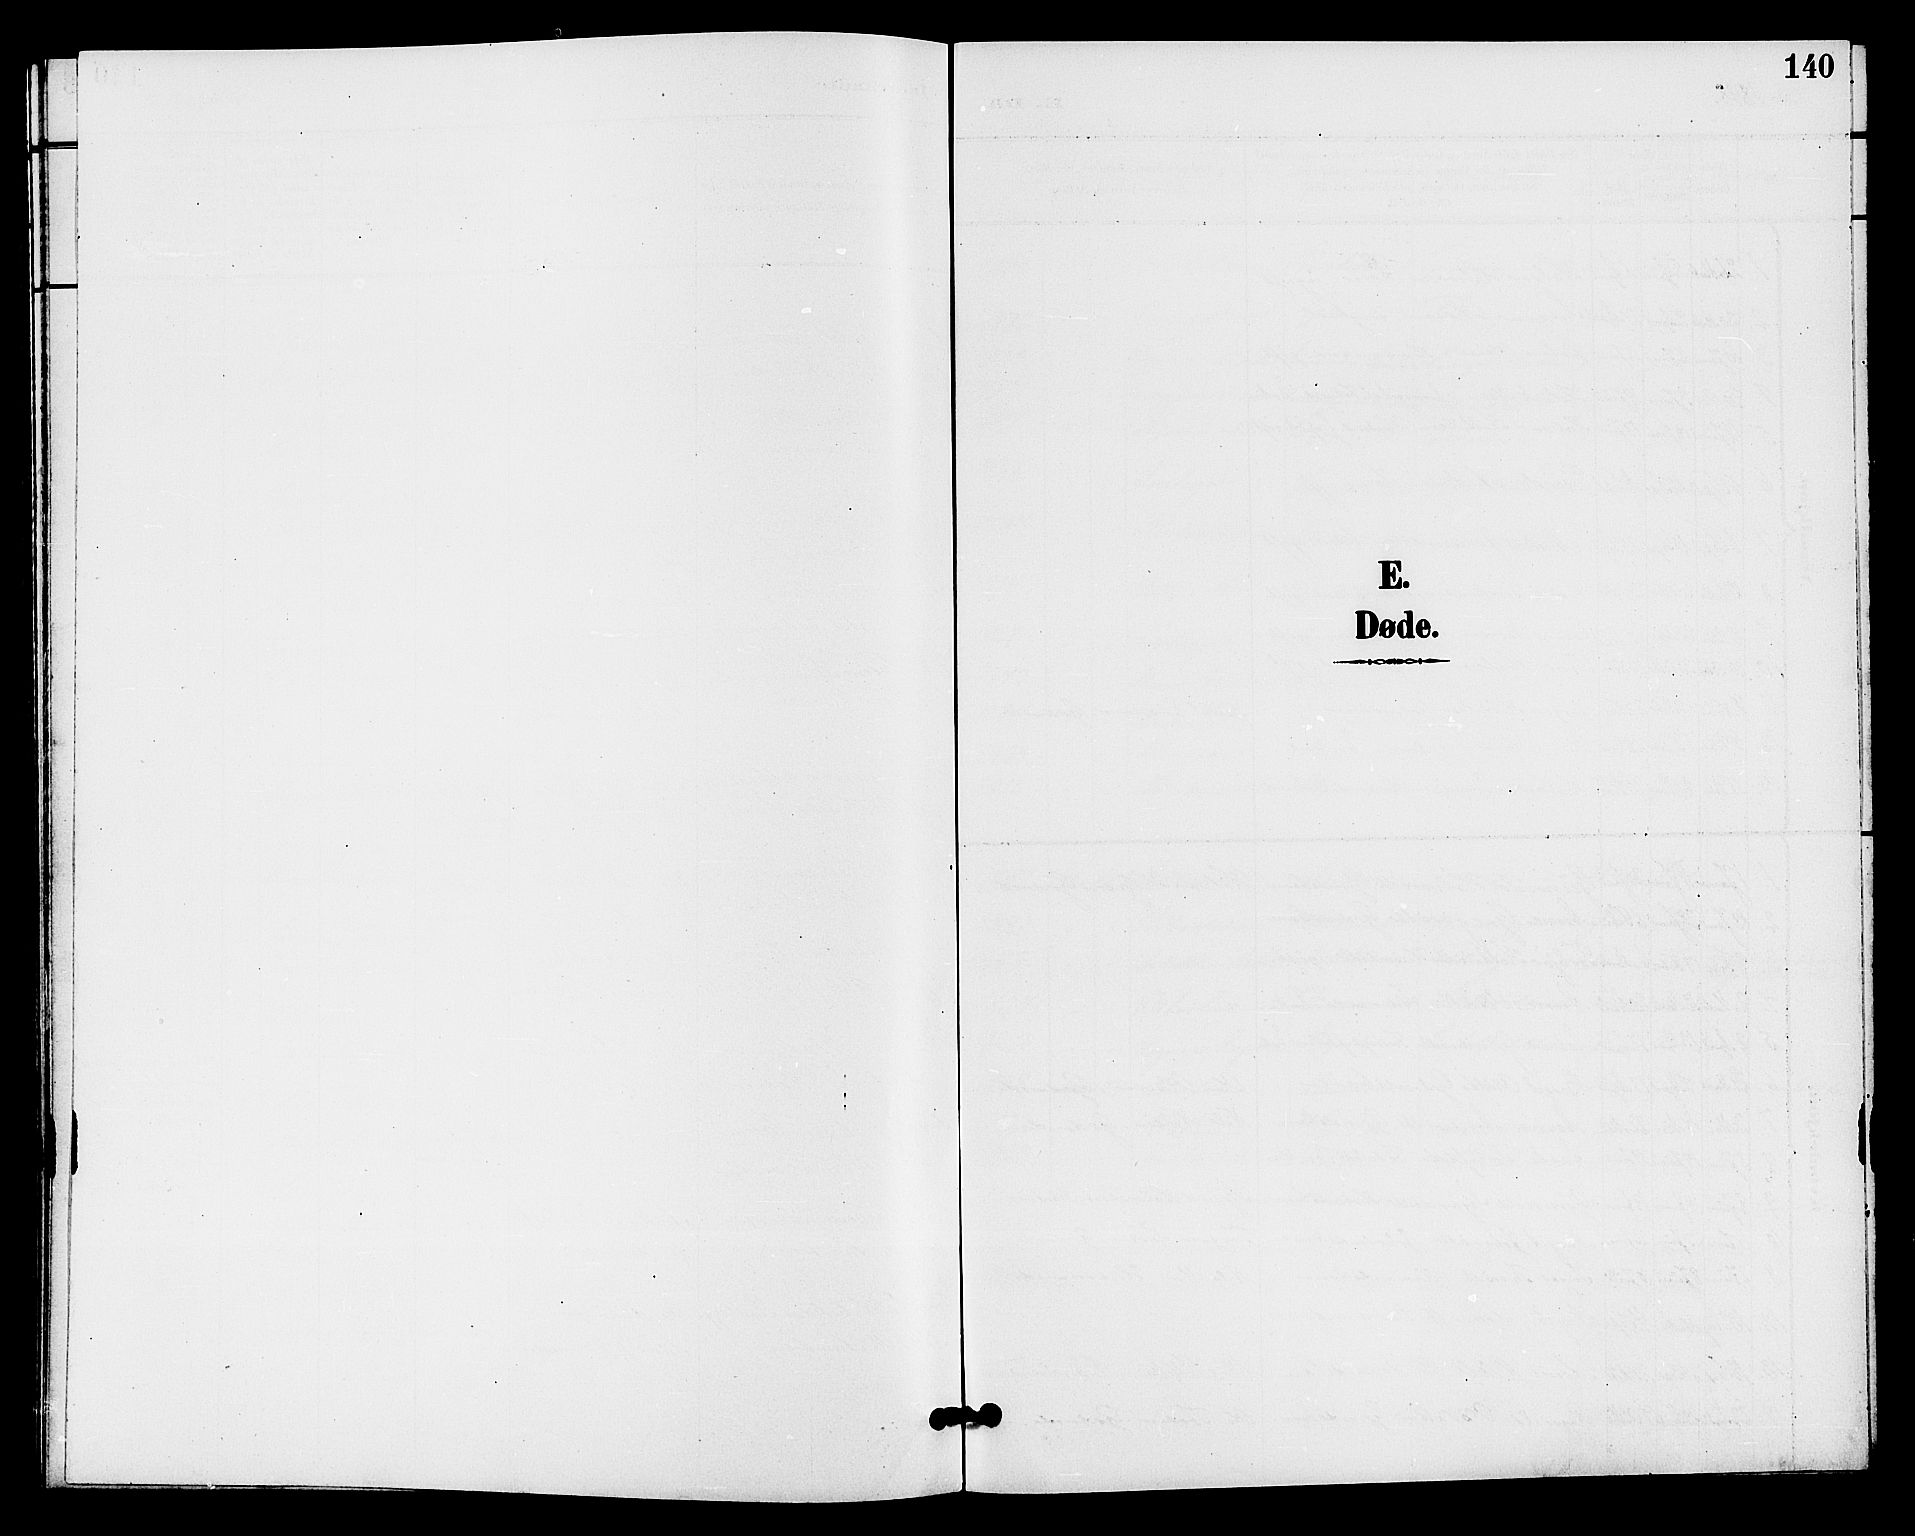 SAKO, Bø kirkebøker, G/Ga/L0006: Klokkerbok nr. 6, 1898-1909, s. 140